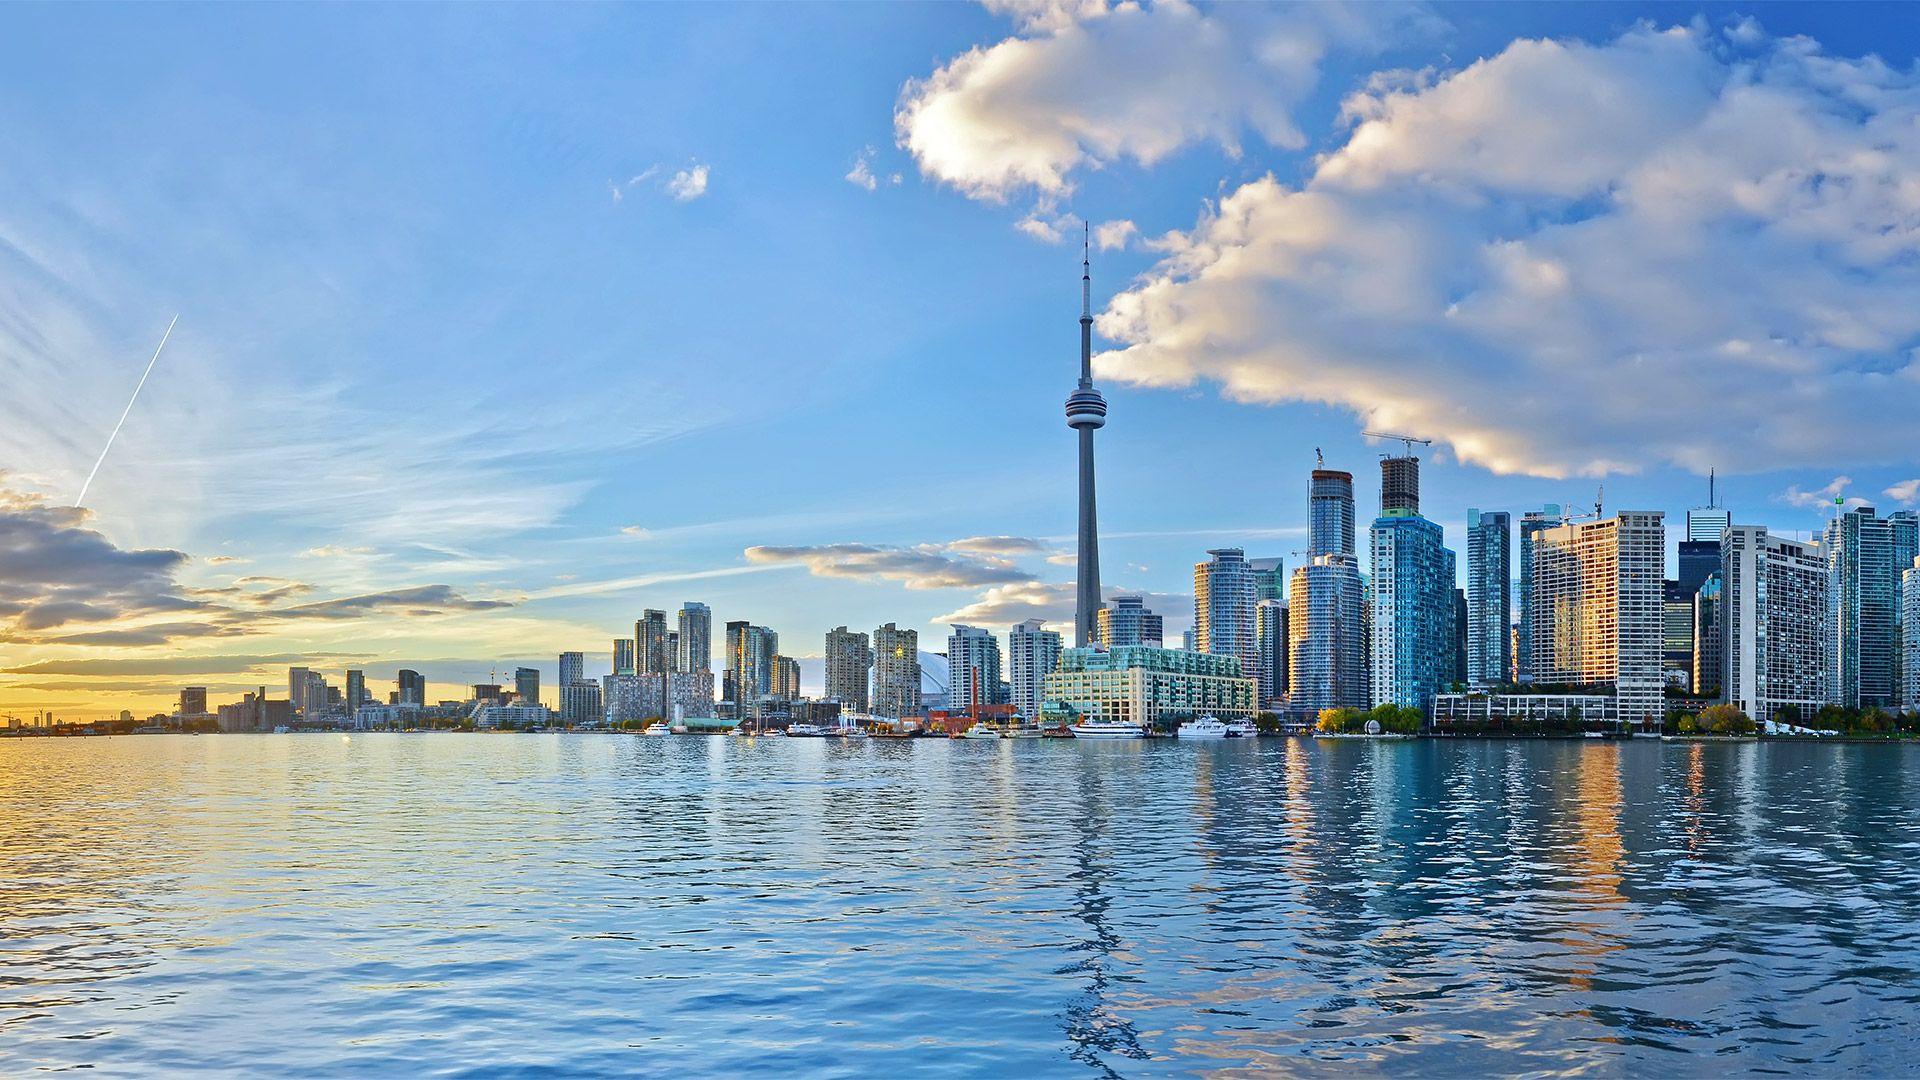 Circuit de grup - Essential Canada Est, 10 zile - cu Ioana Dumitrescu